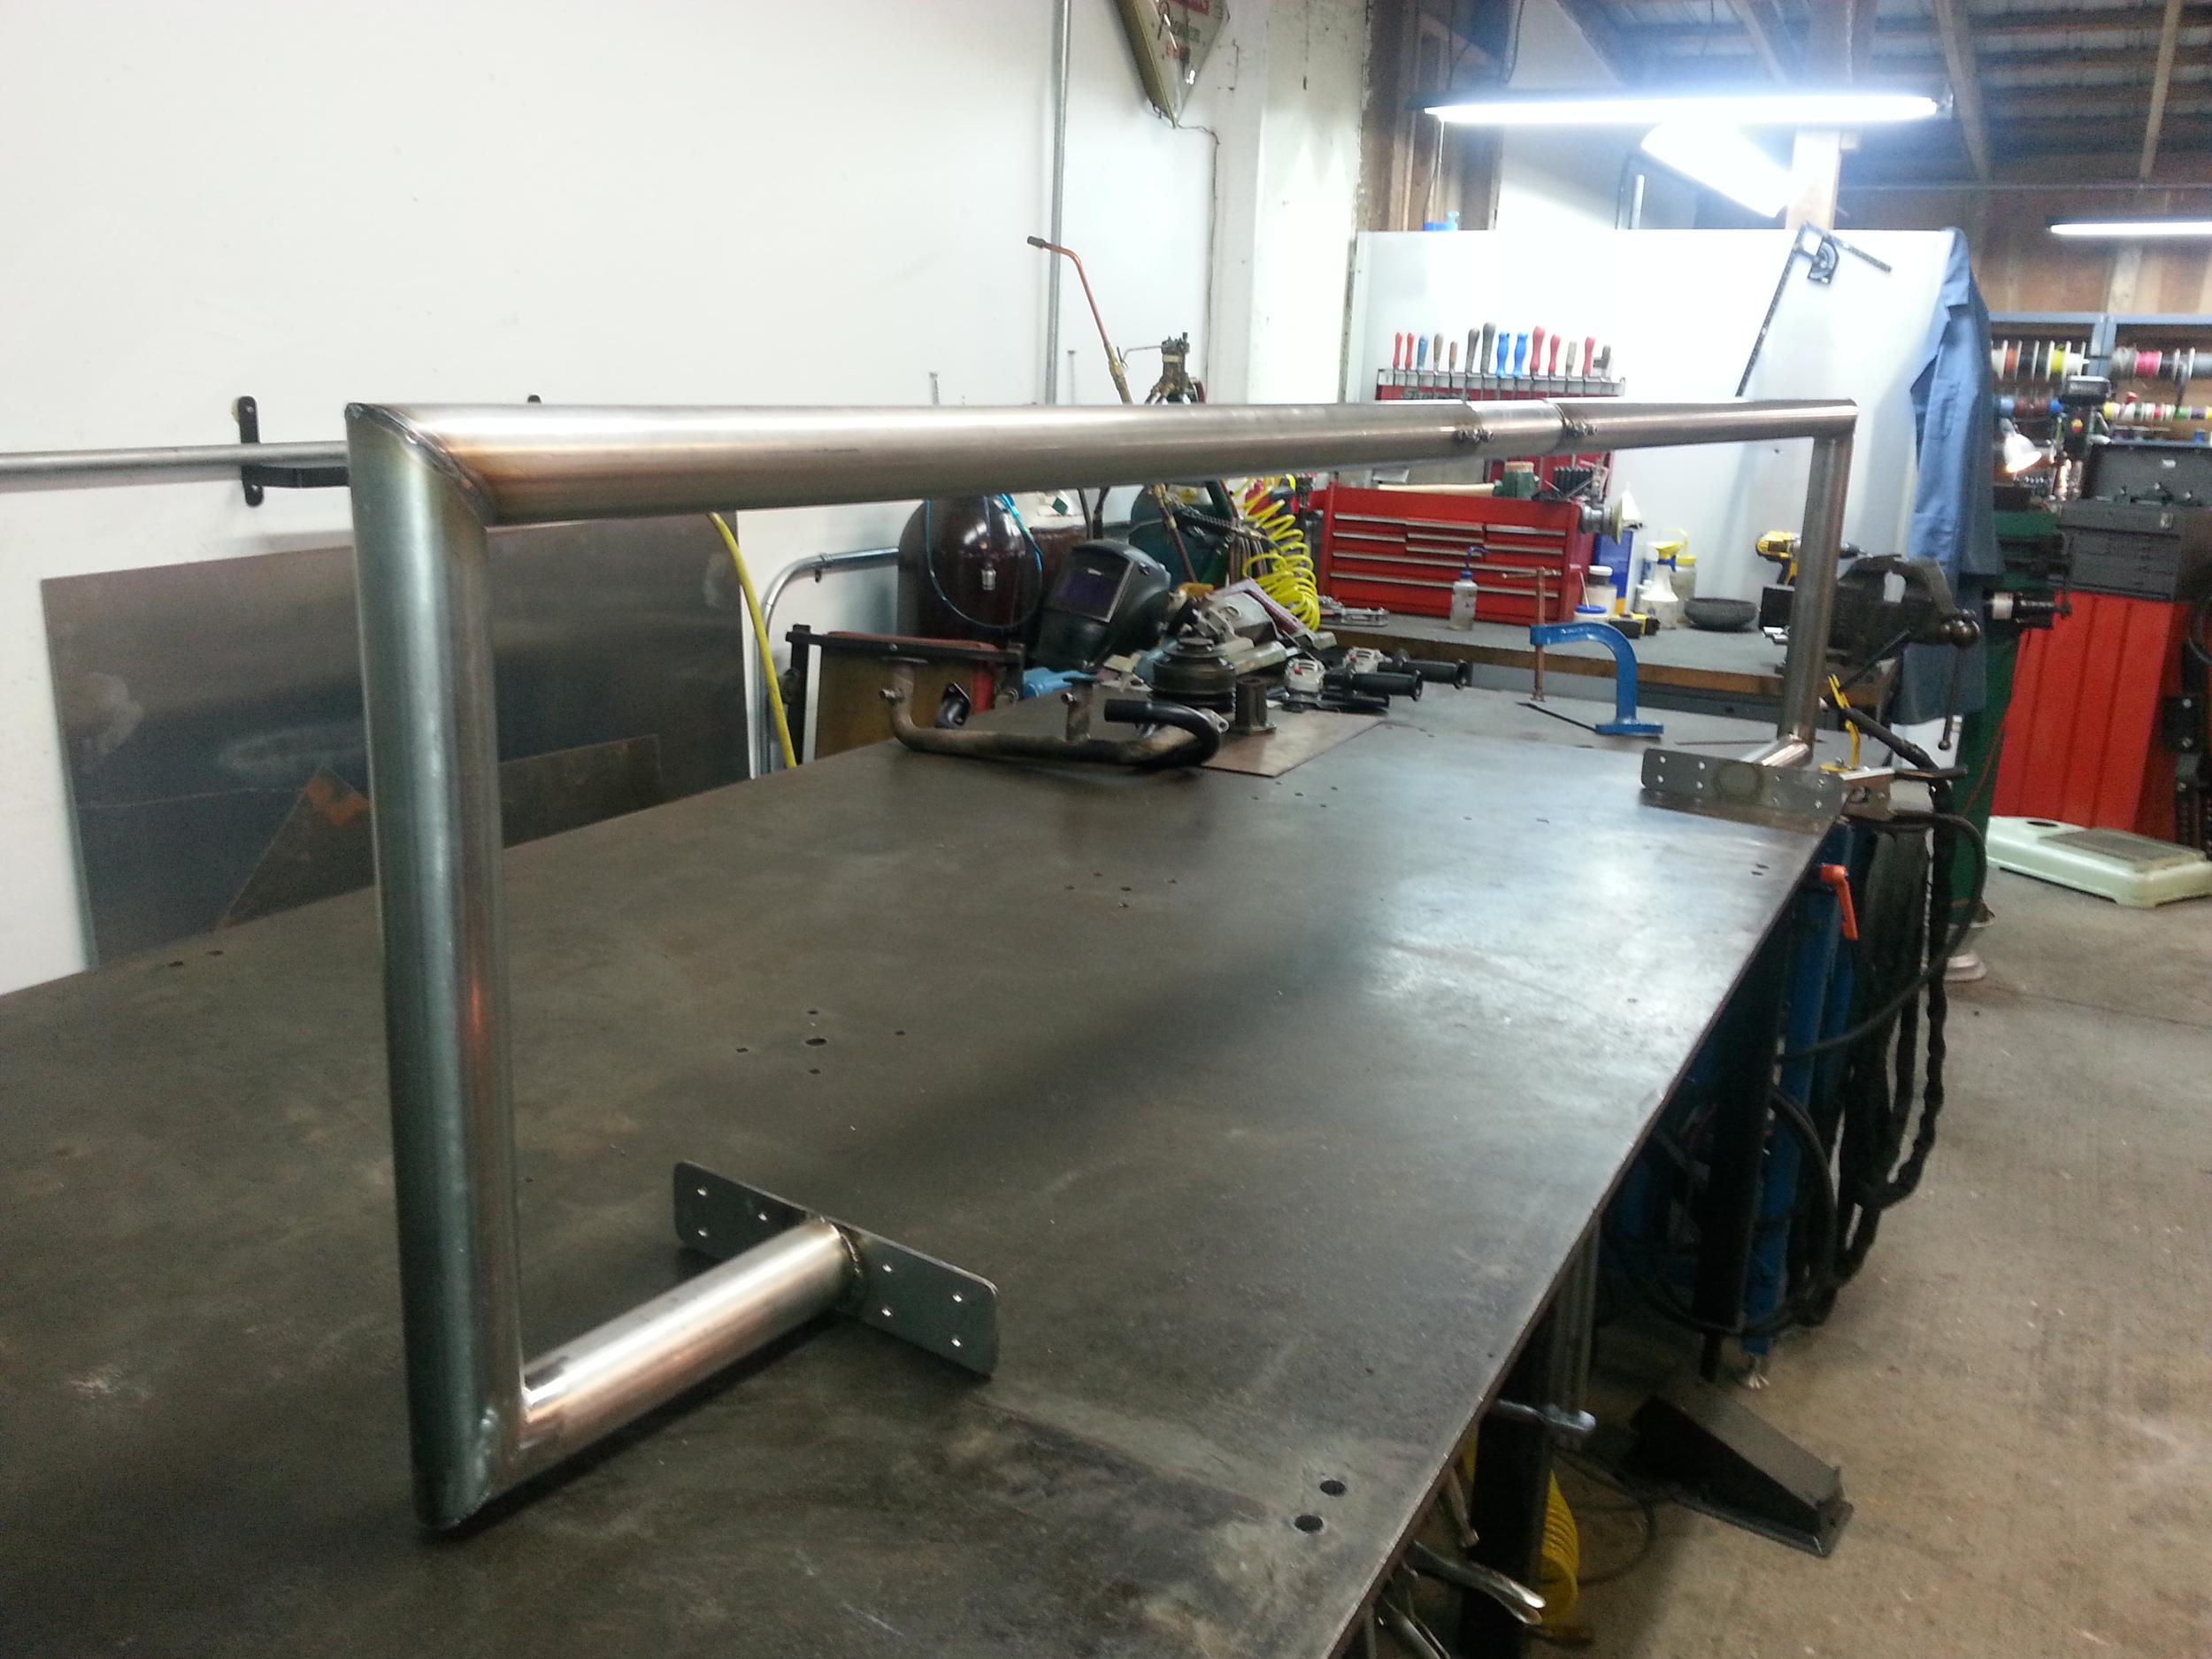 304 stainless steel Moxon Clawham antenna bracket